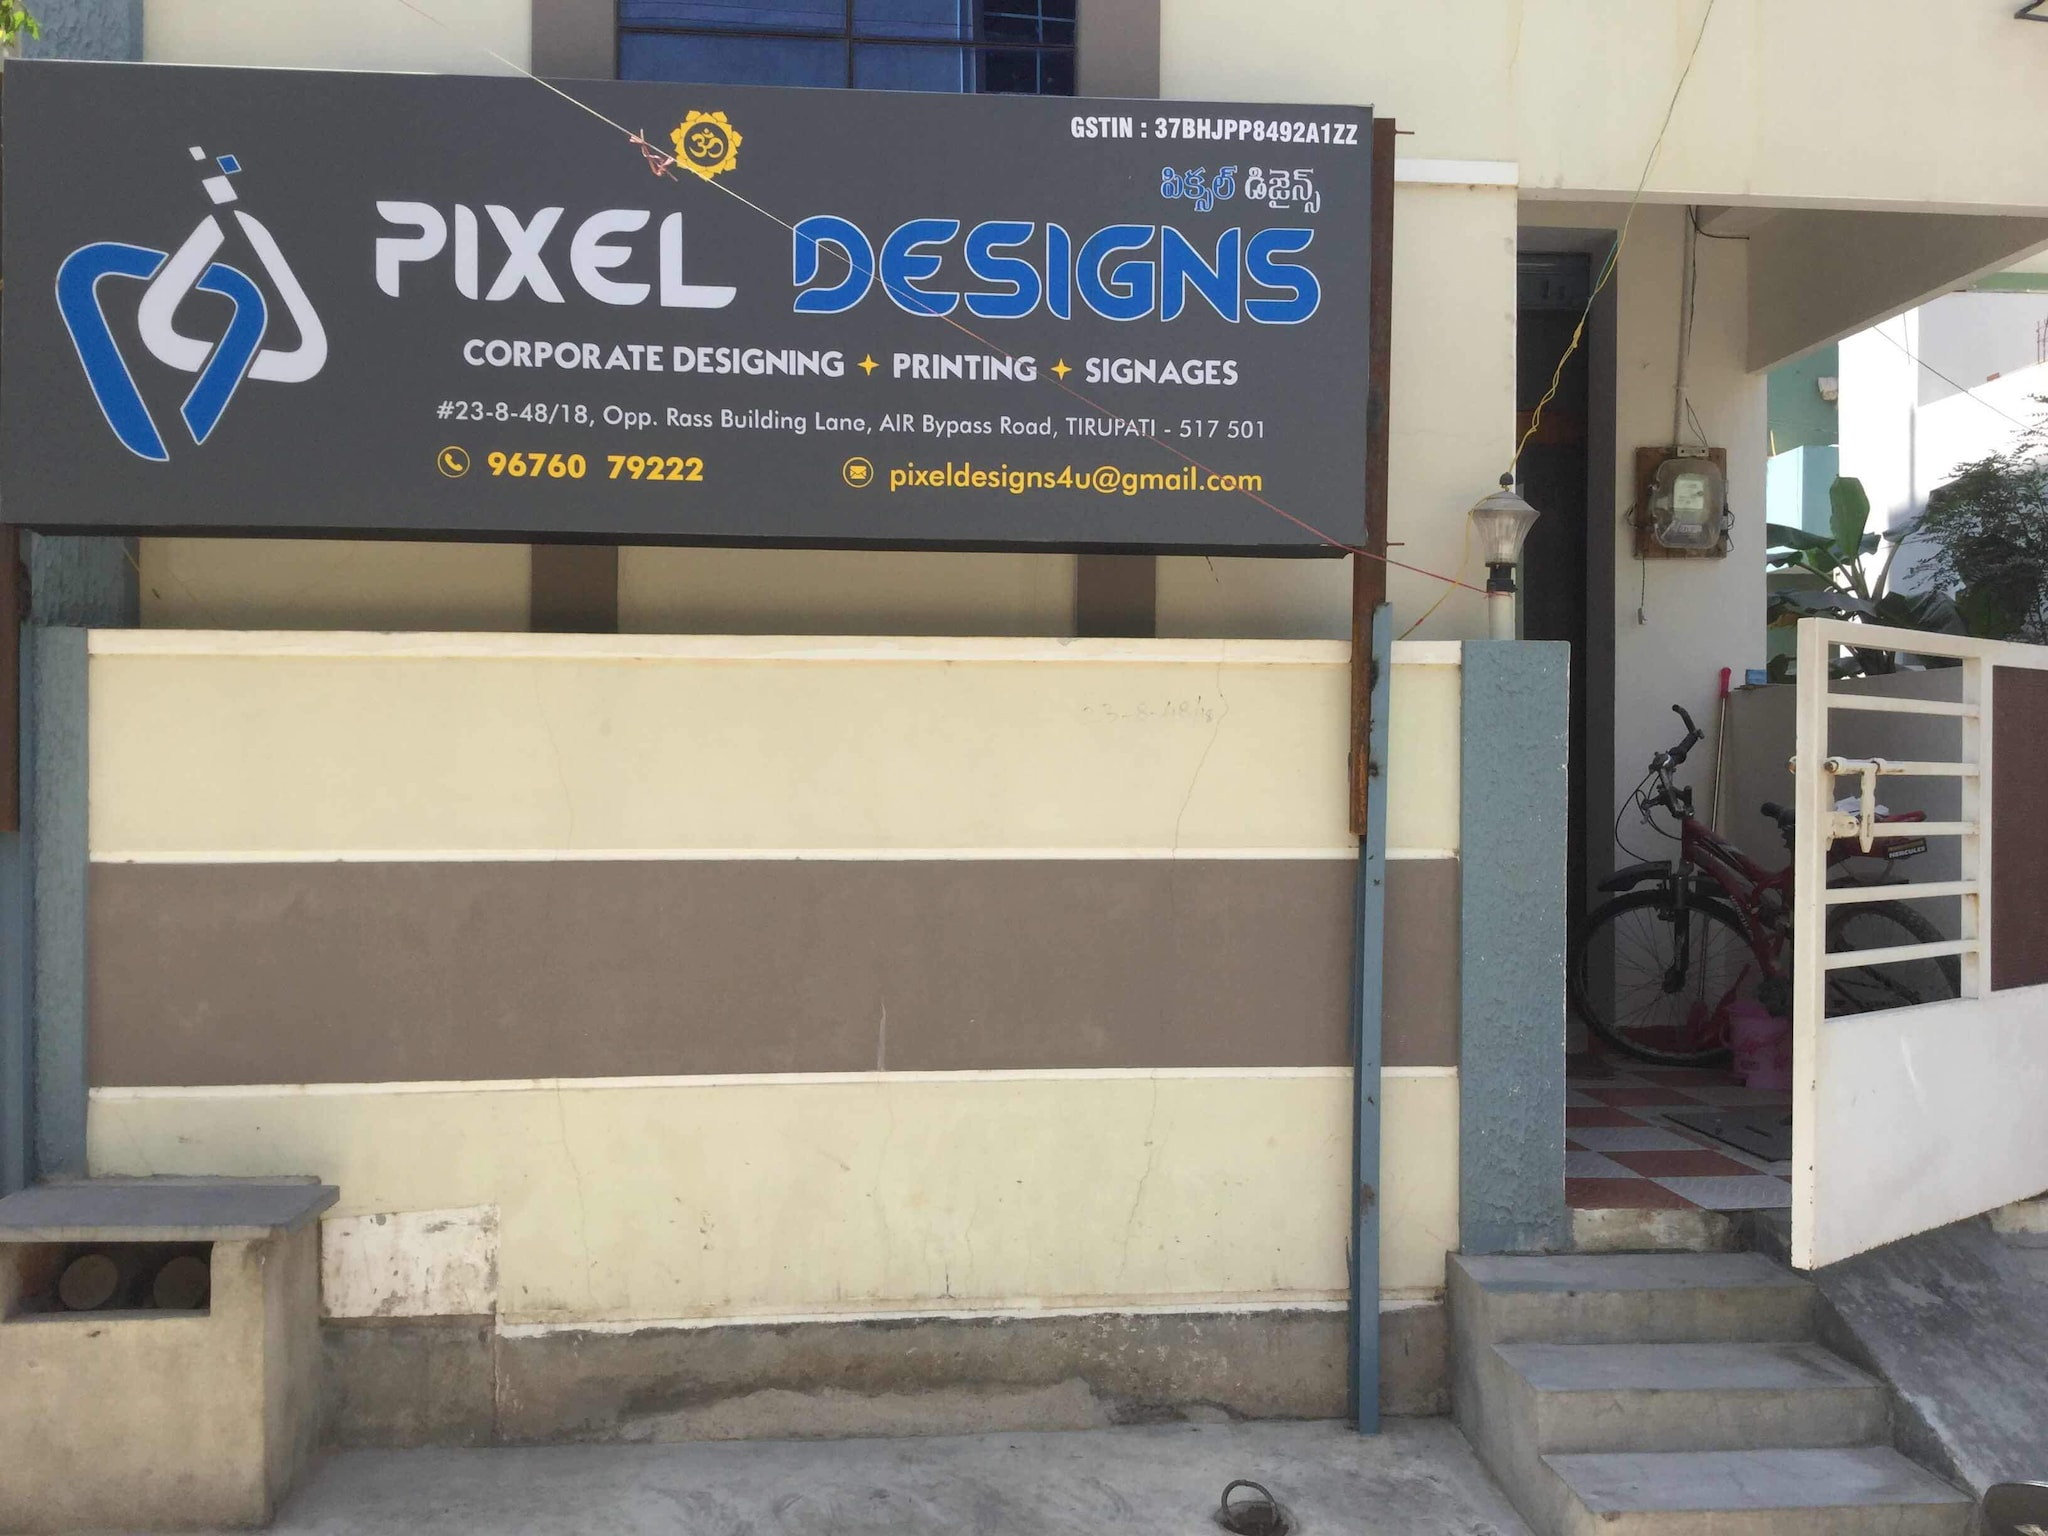 Top Computer Graphic Designers In Tirupati Best Graphic Designers